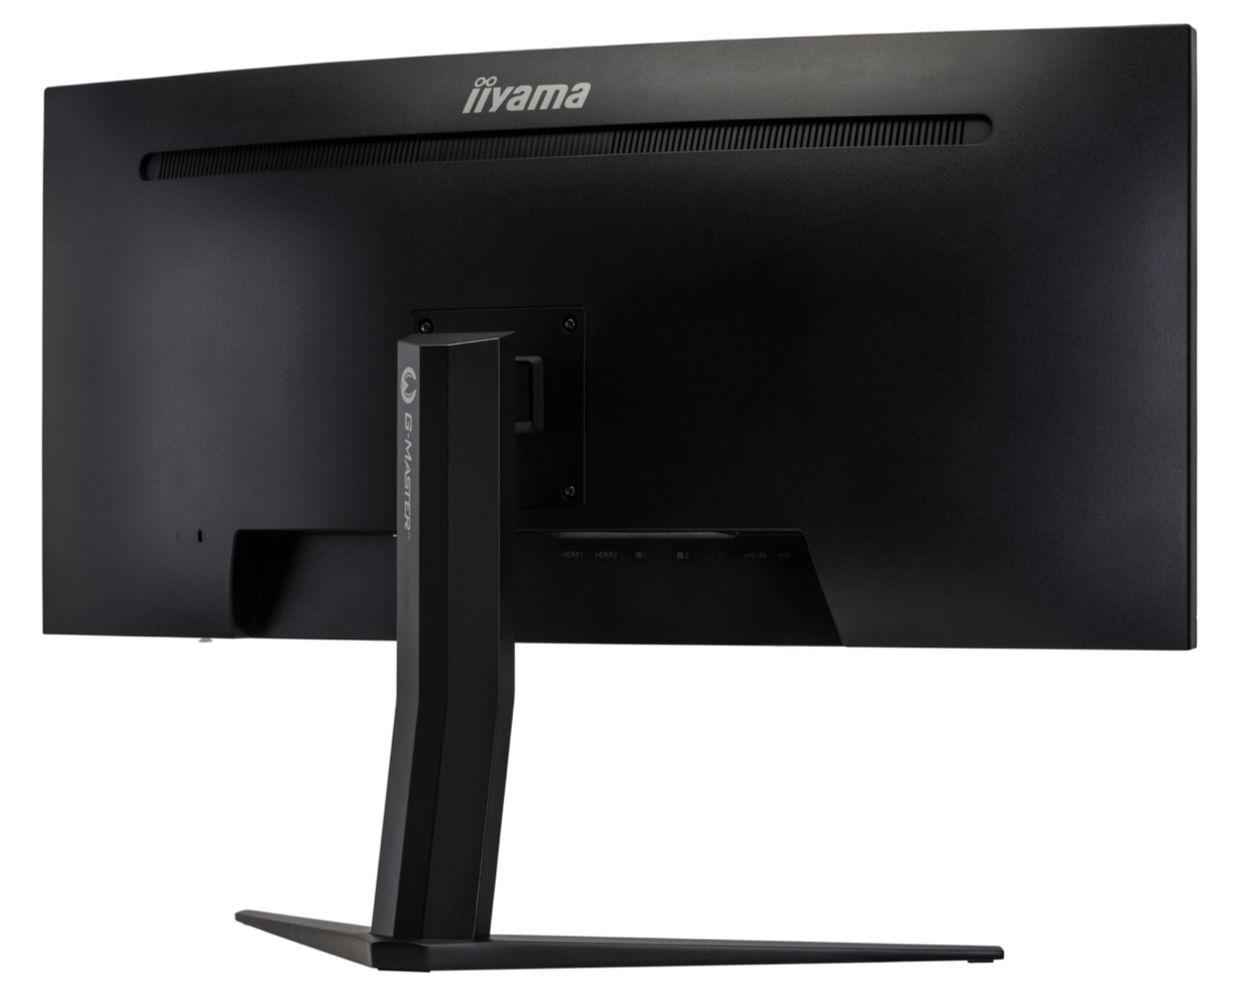 iiyama G Master GB3466WQSU 34 UWQHD Curved Gaming Monitor mit 144Hz für 429,90€ (statt 479€)